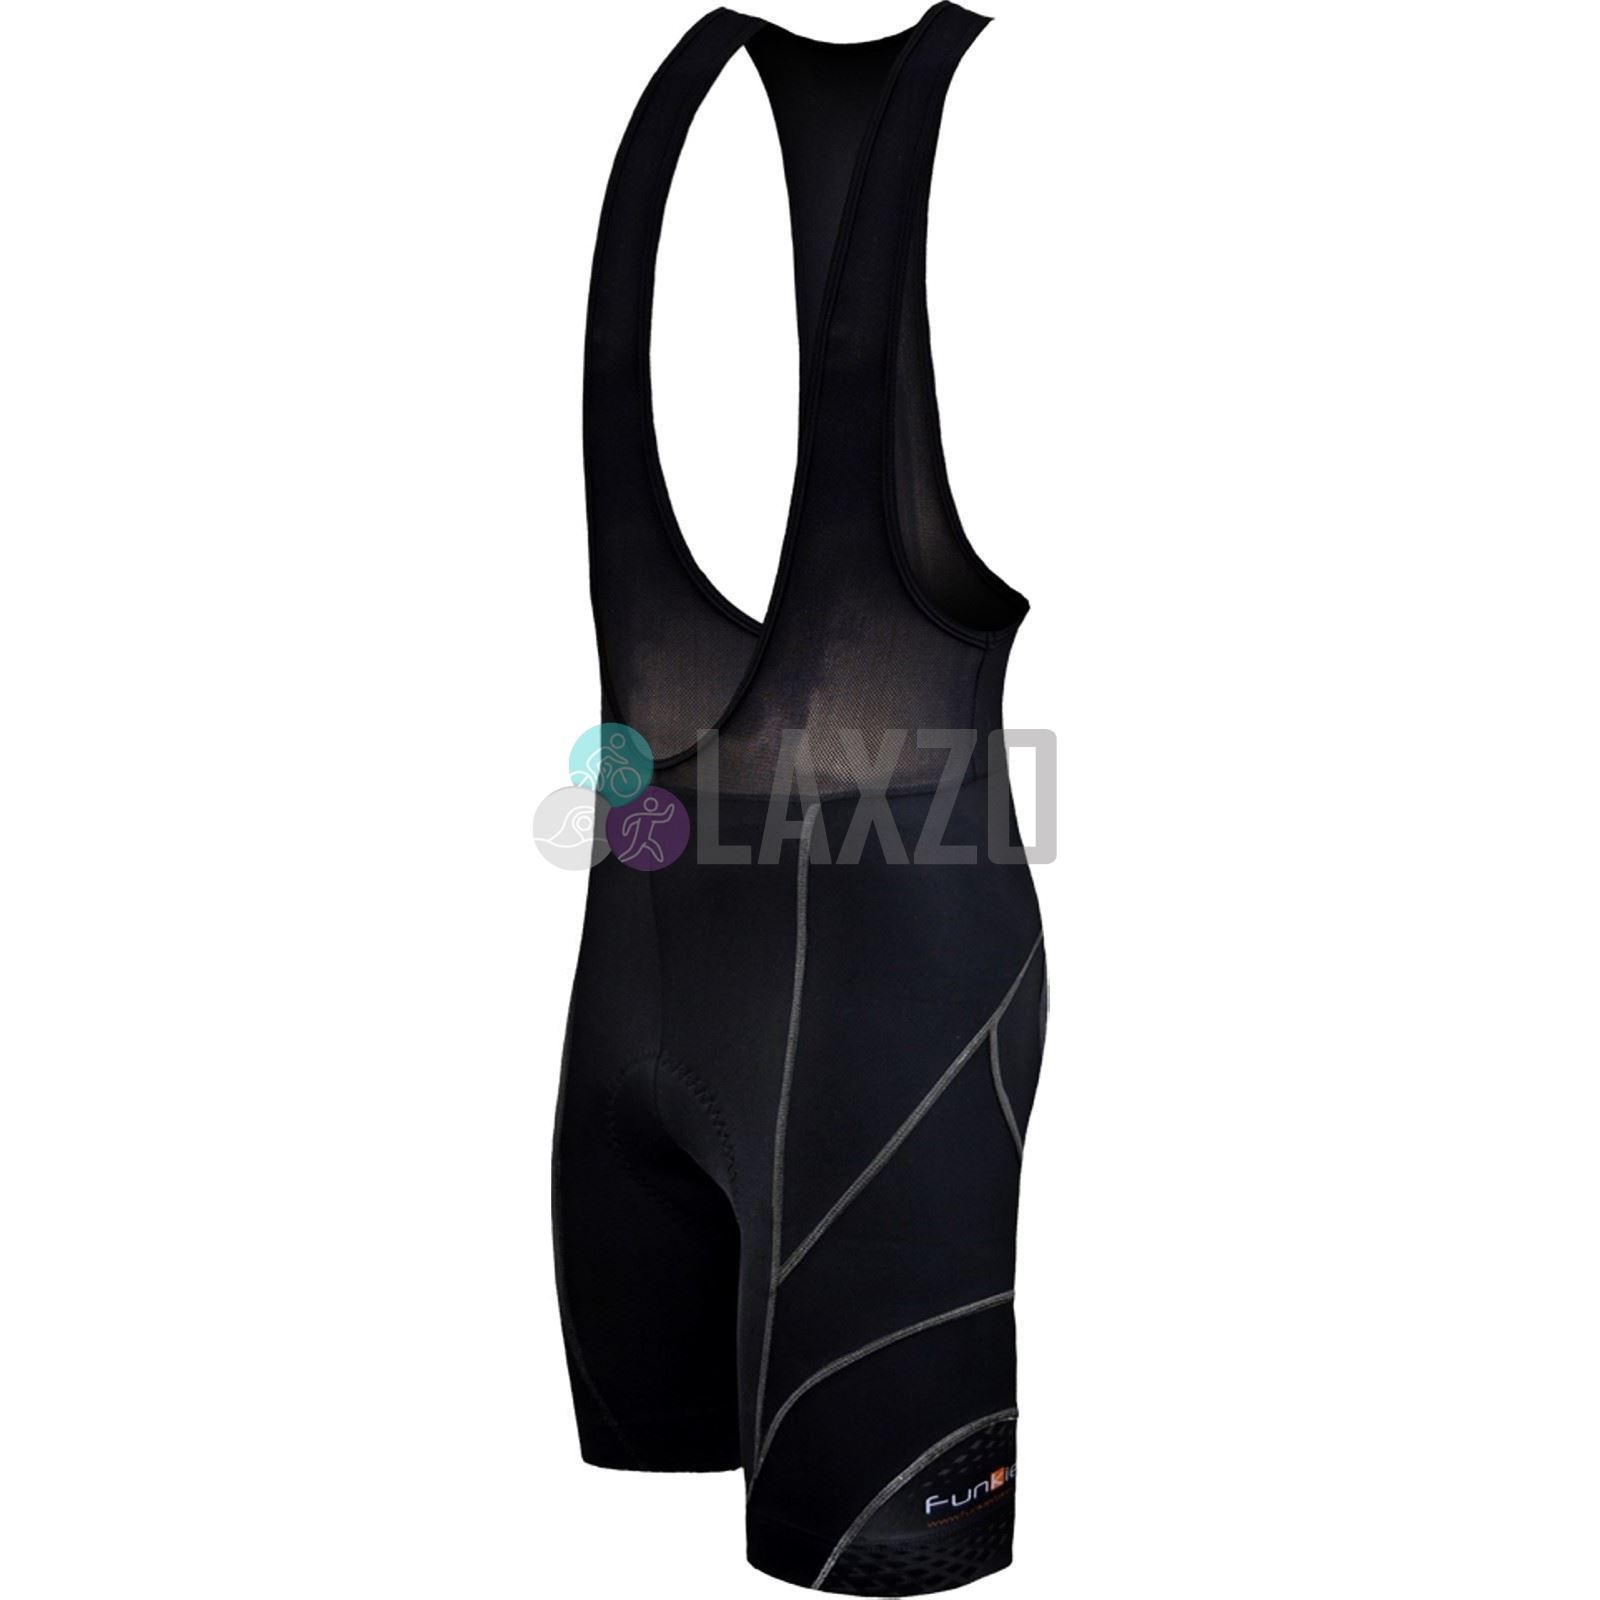 Funkier Force S-922-C7 Active 17 Panel Bib Shorts in Black Large